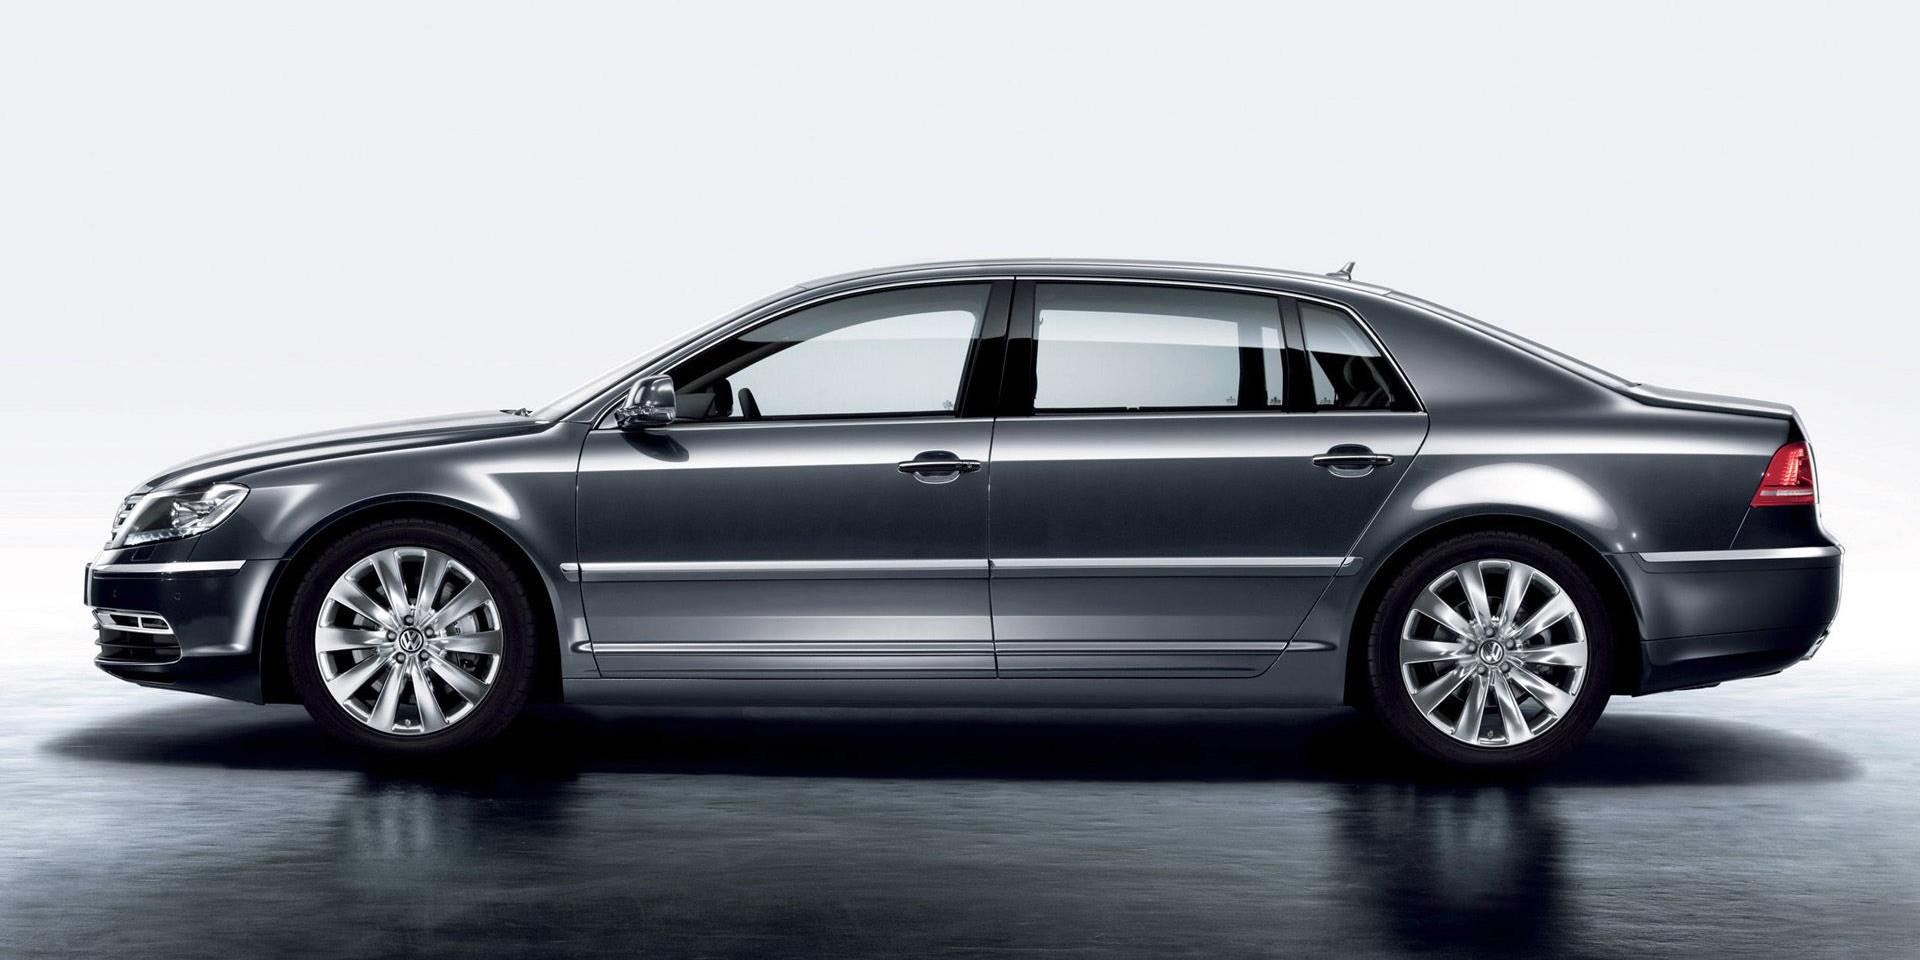 Side Pose Of 2011 Volkswagen Phaeton In Grey